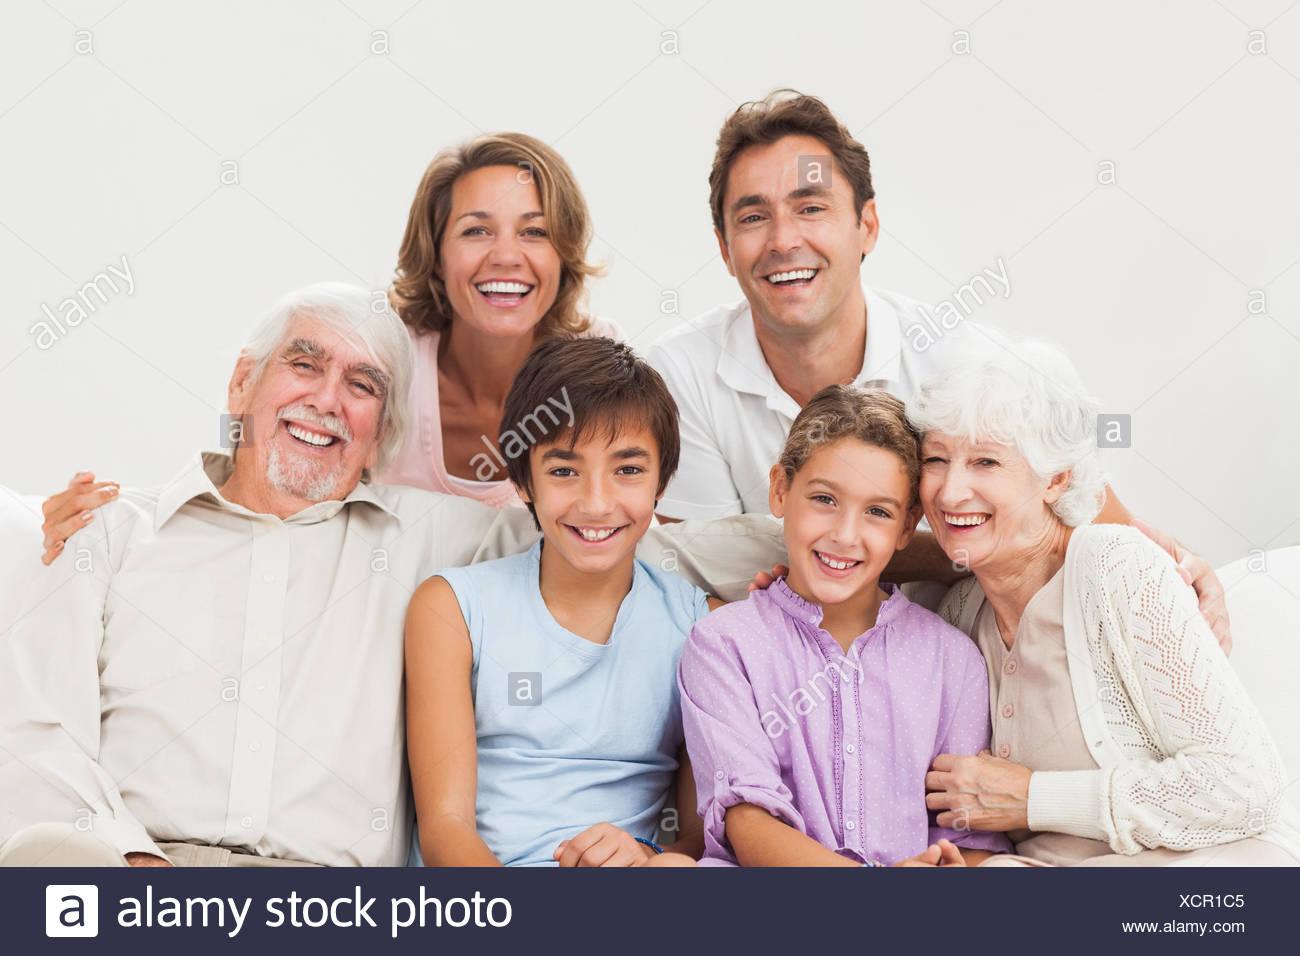 Extended family portrait Stock Photo